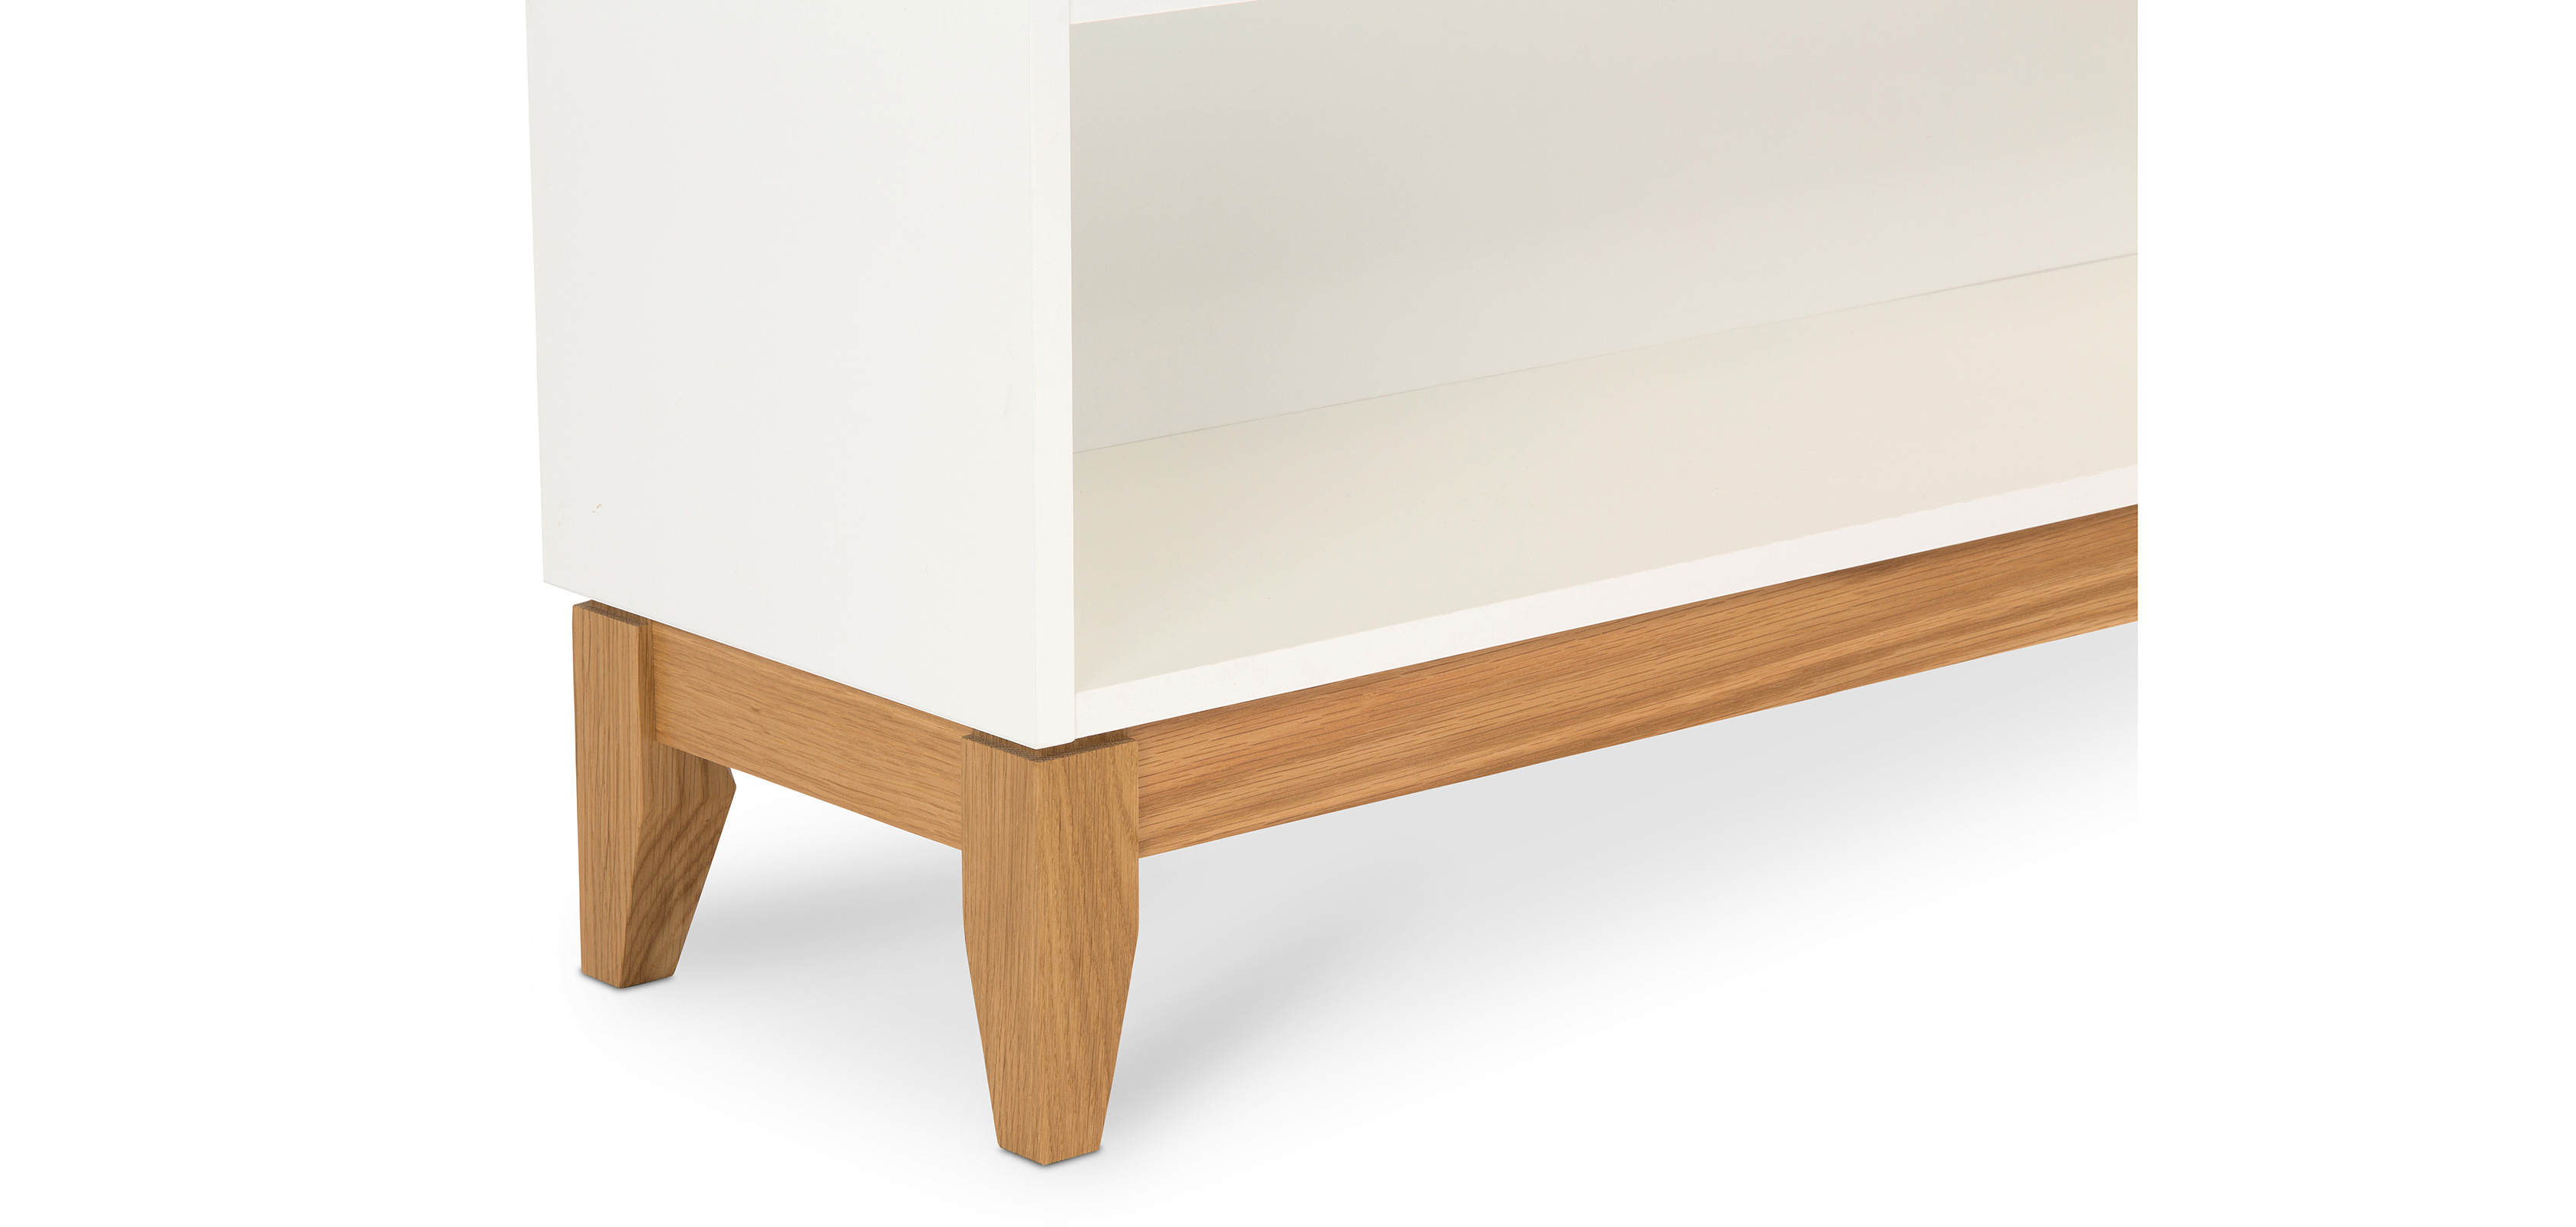 biblioth que console de style scandinave. Black Bedroom Furniture Sets. Home Design Ideas